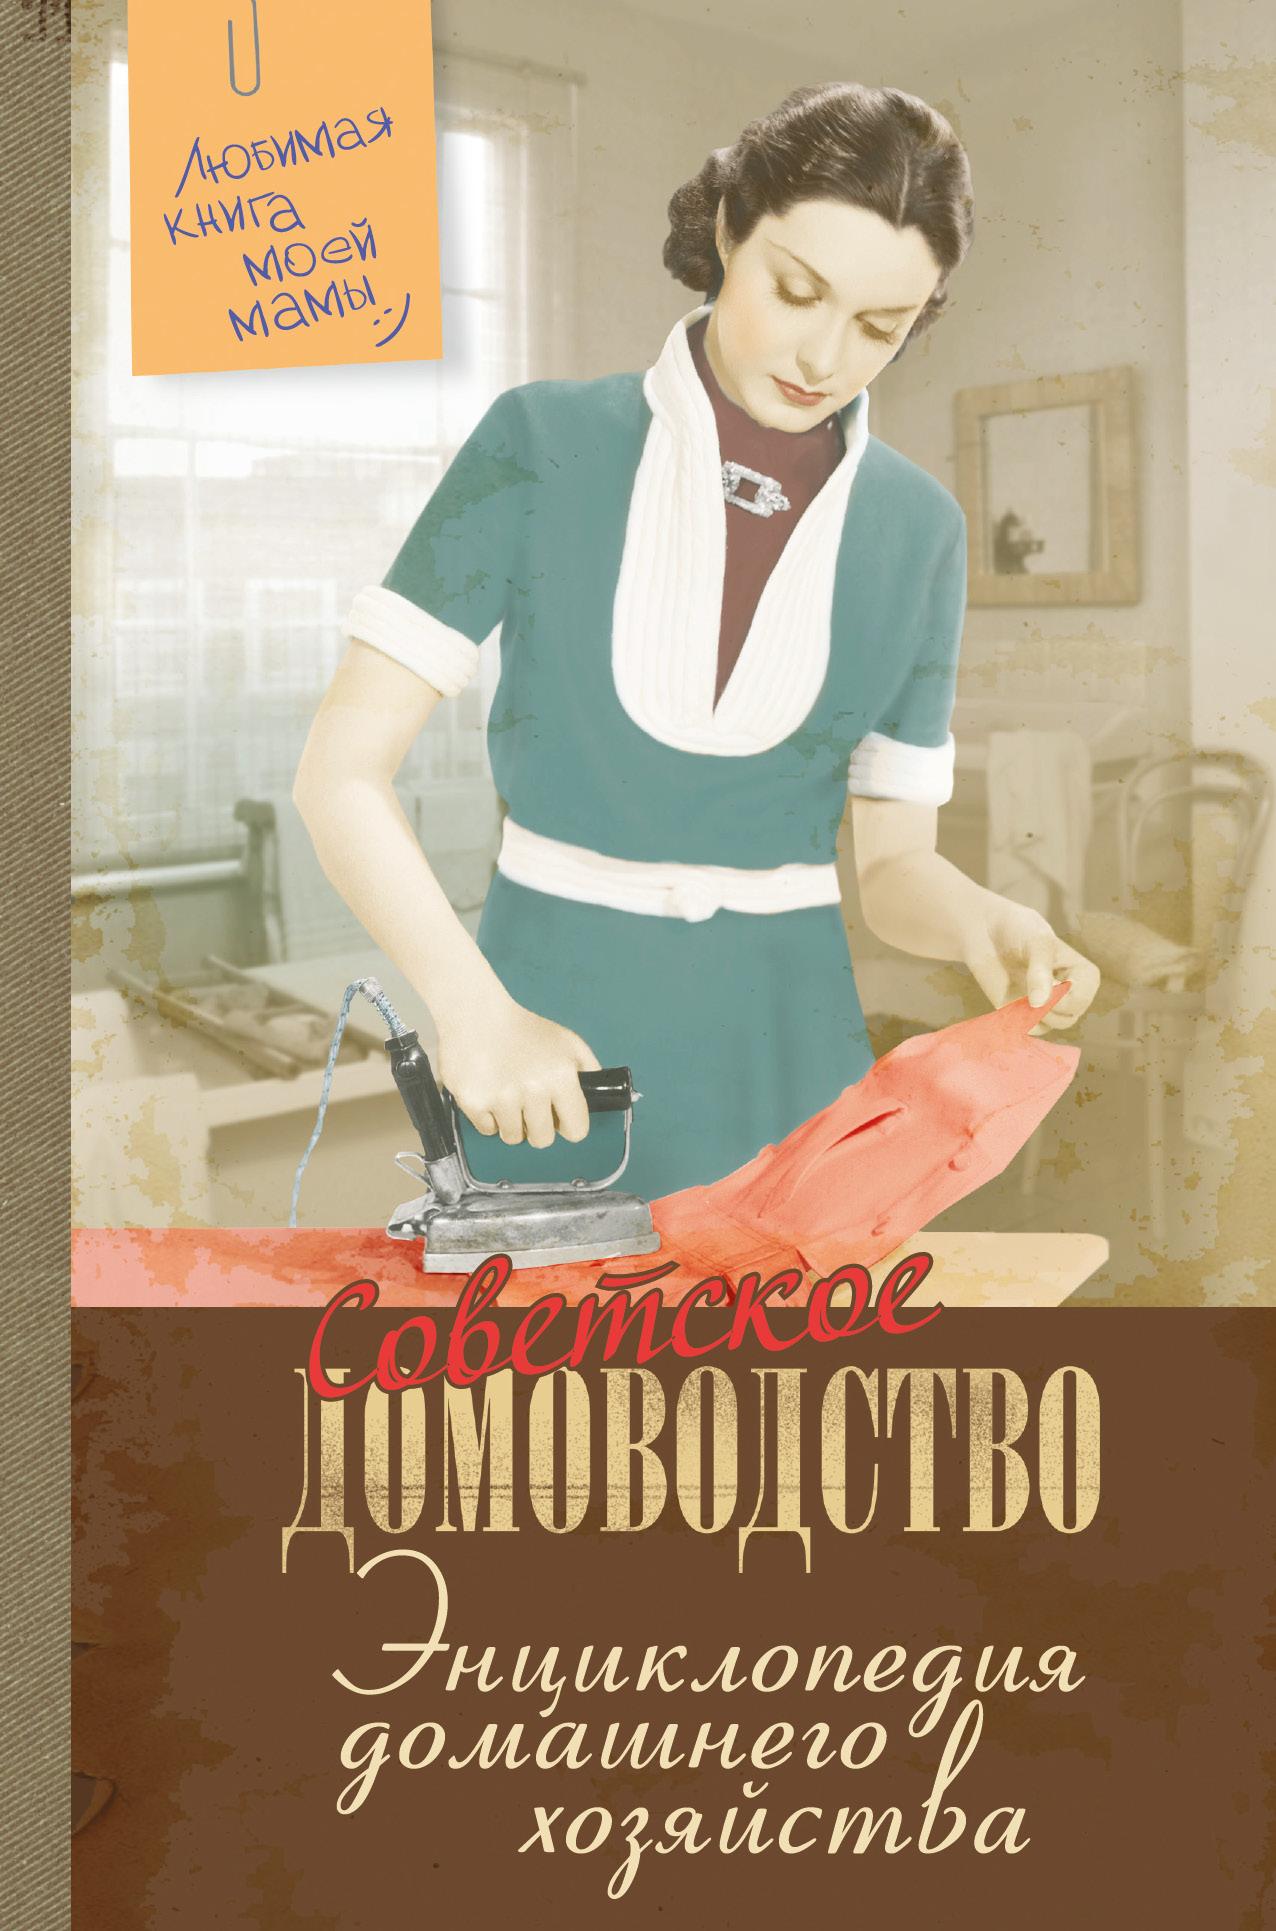 Энциклопедия домашнего хозяйства ( Скотт Каван, Райт Марк  )